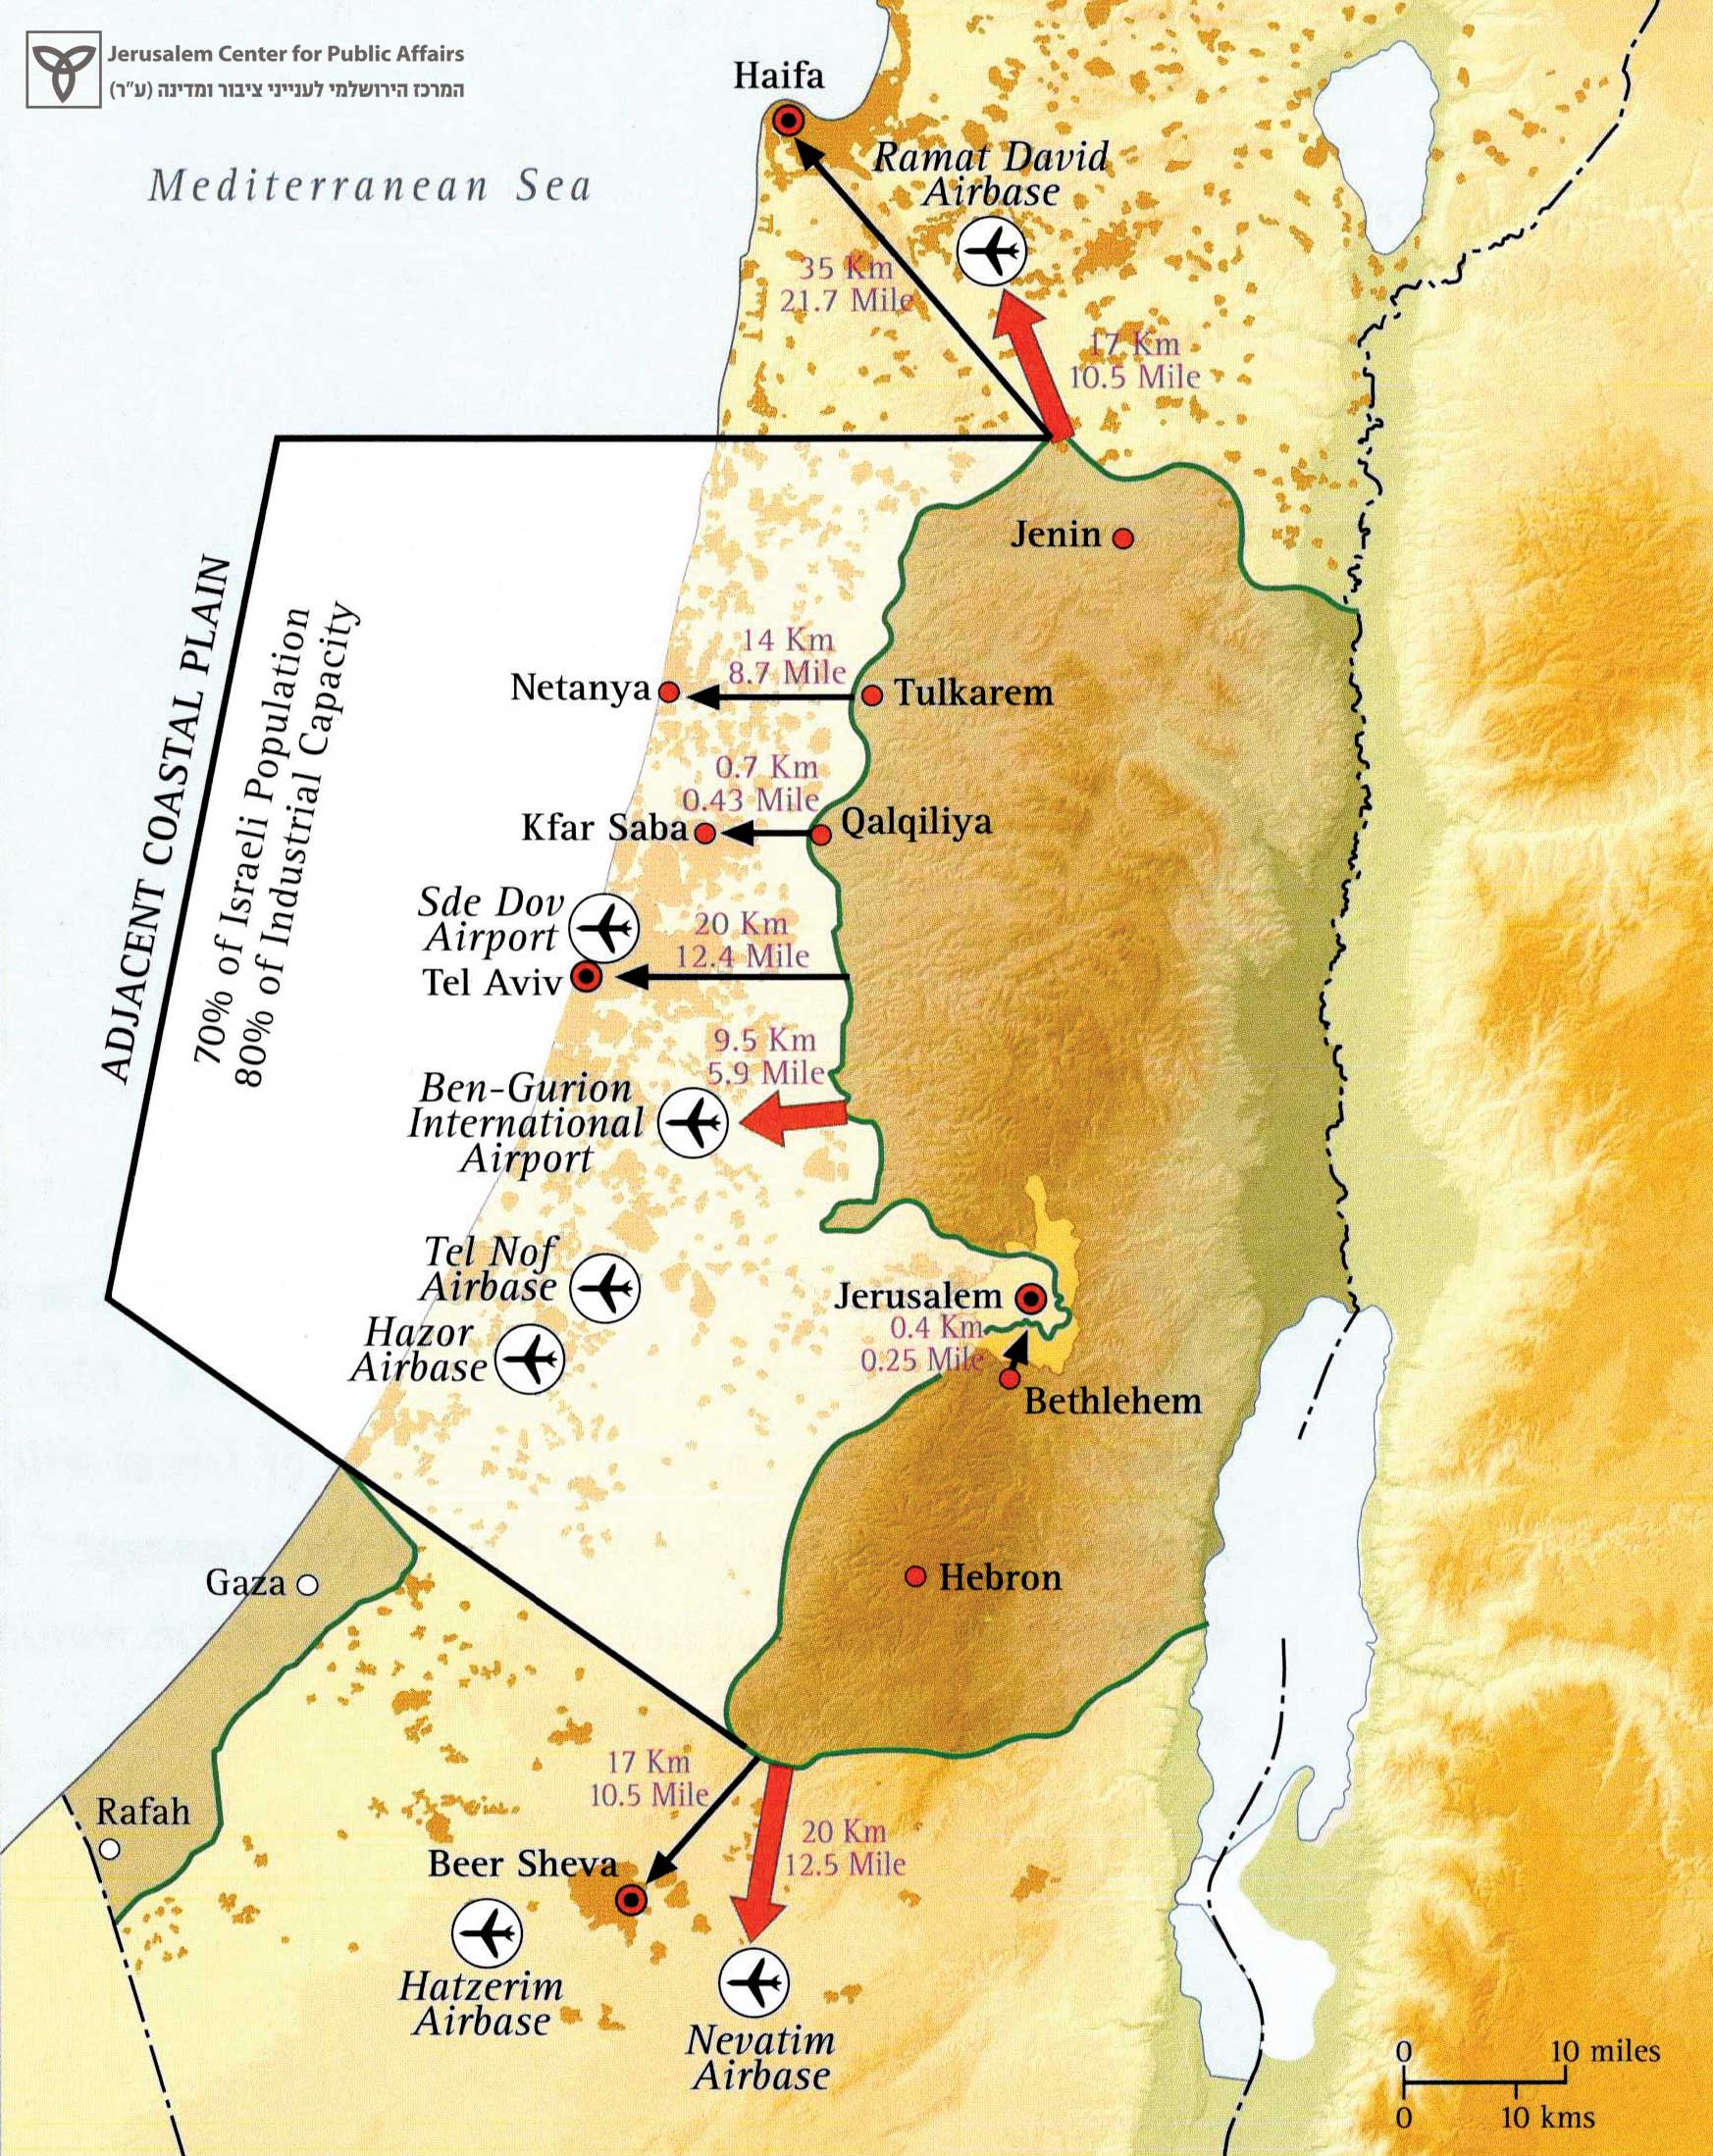 Defensible Borders to Ensure Israel's Future